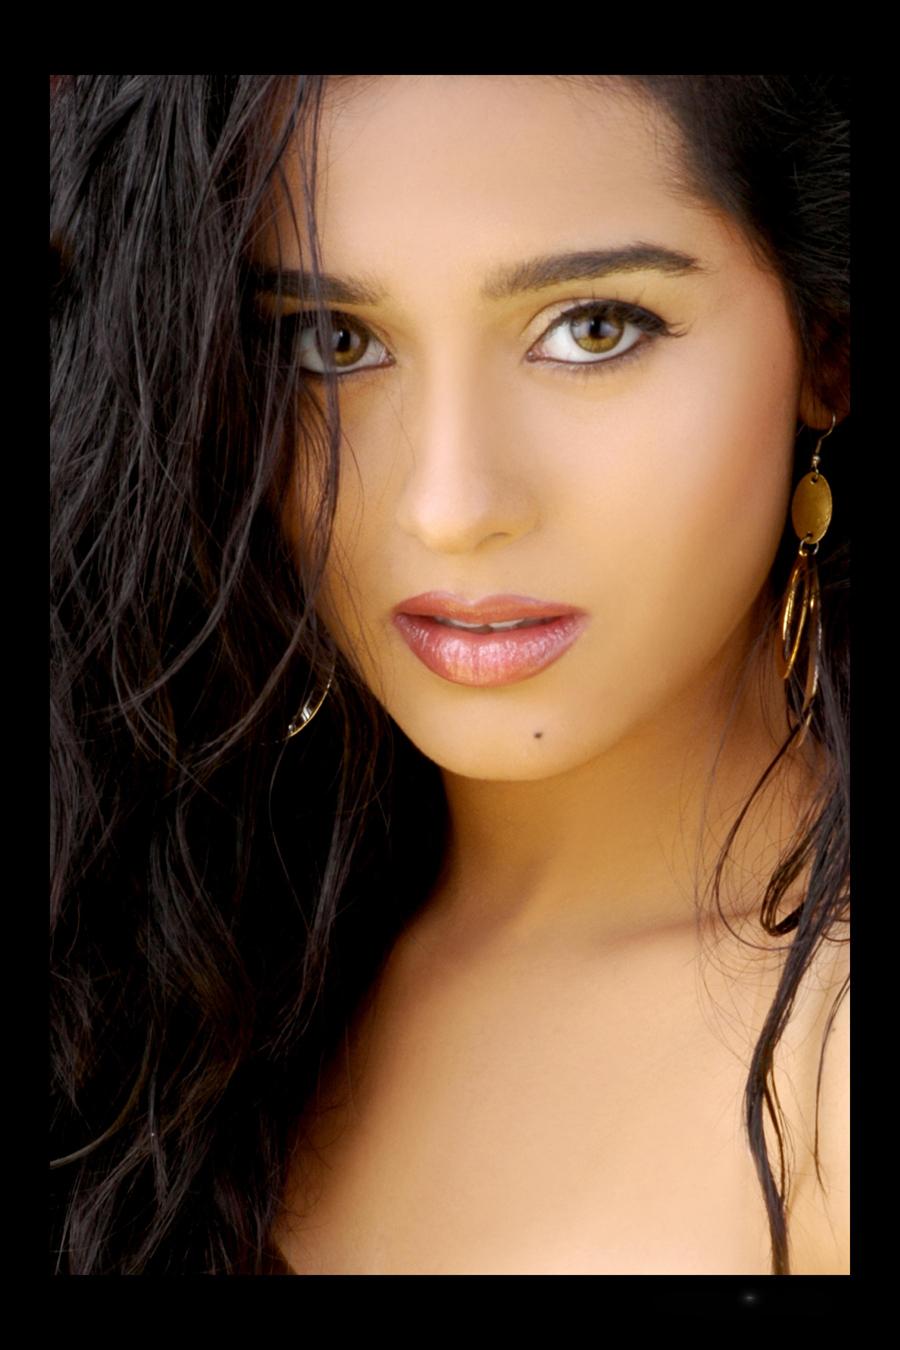 Amrita Rao Kiss Original Source Of Image